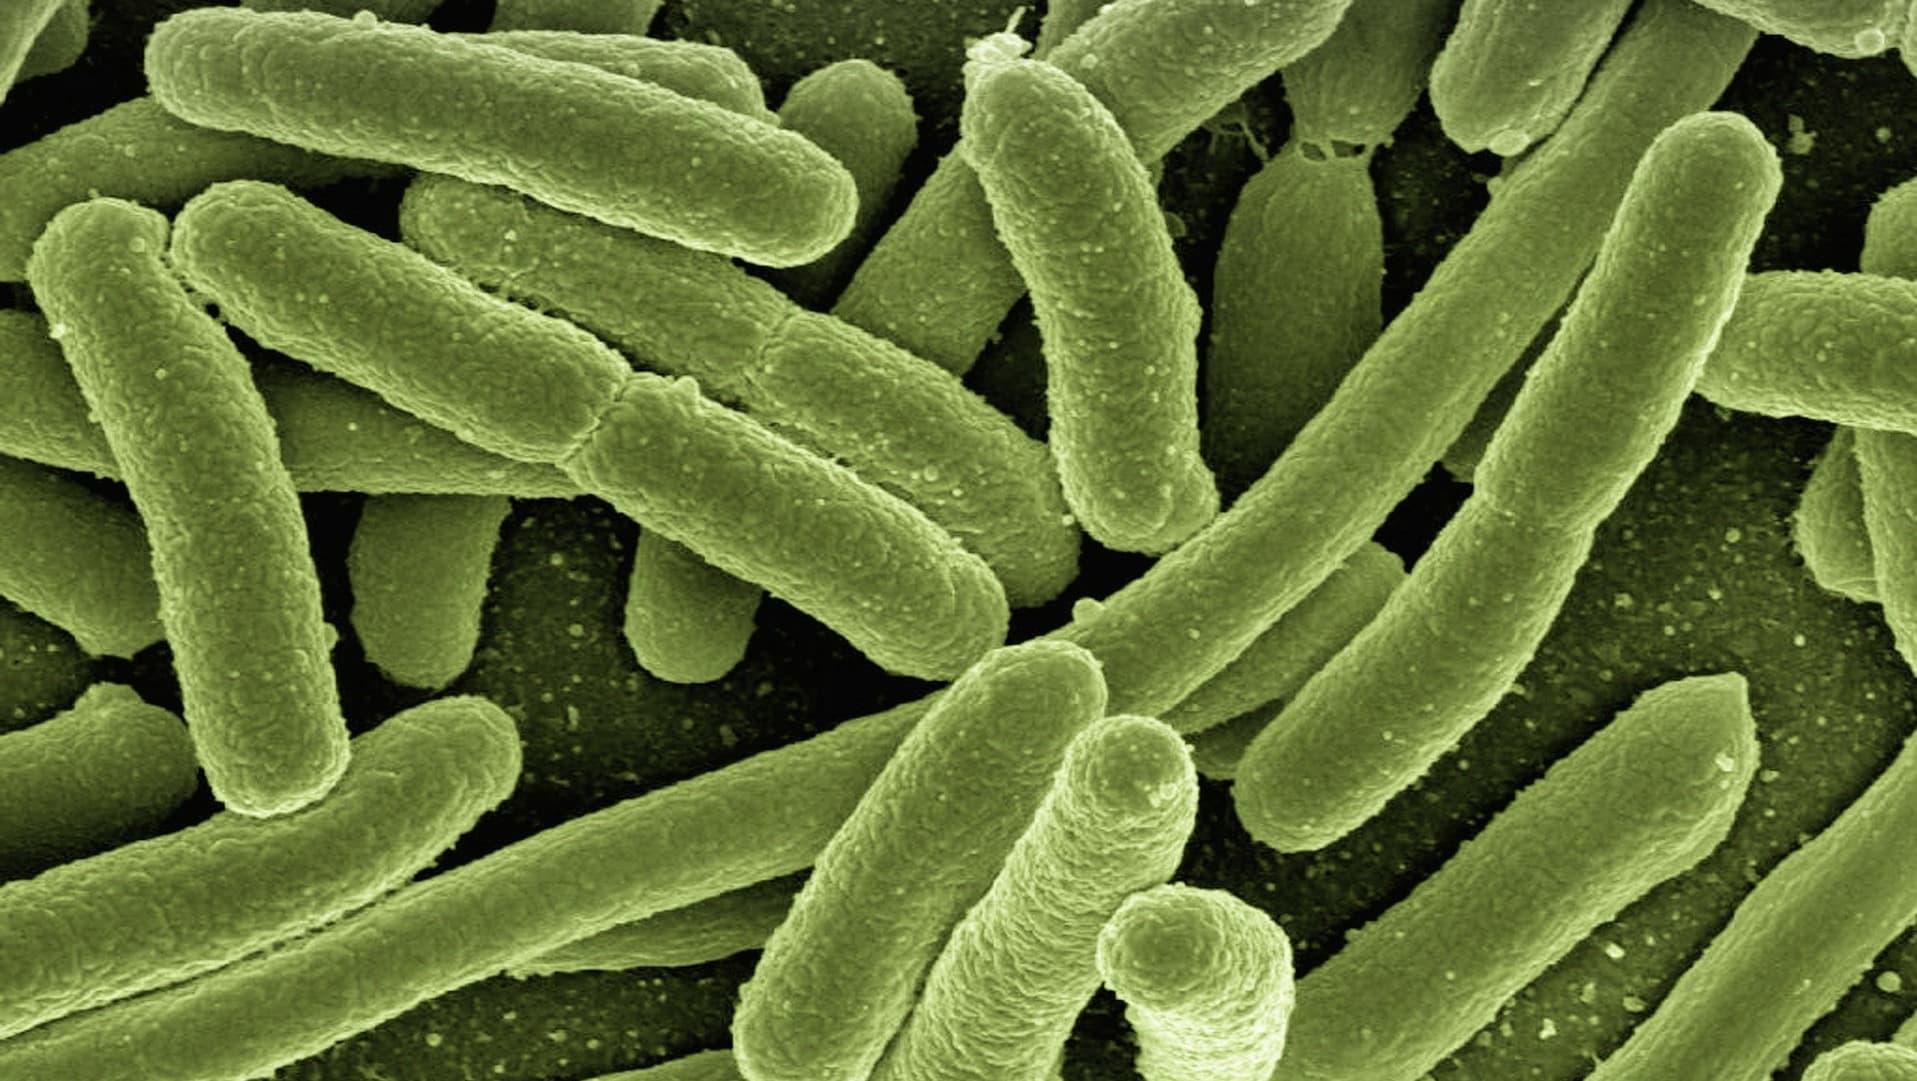 Viele grüne Bakterien unter dem Mikroskop